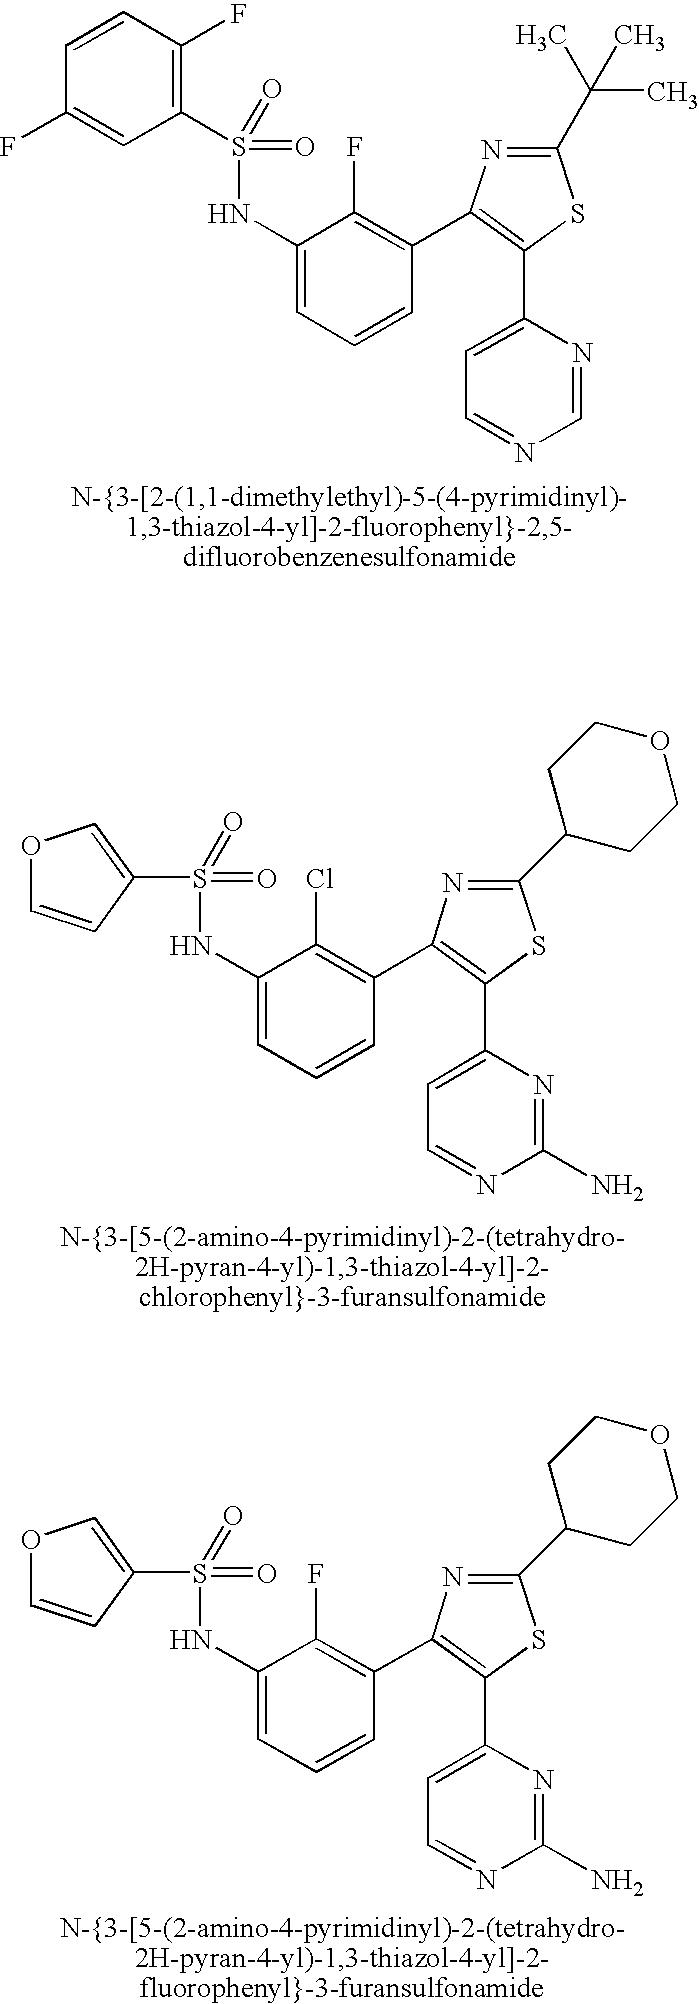 Us20090298815a1 Benzene Sulfonamide Thiazole And Oxazole Compounds Bolens G174 Wiring Diagram Figure 20091203 C00011